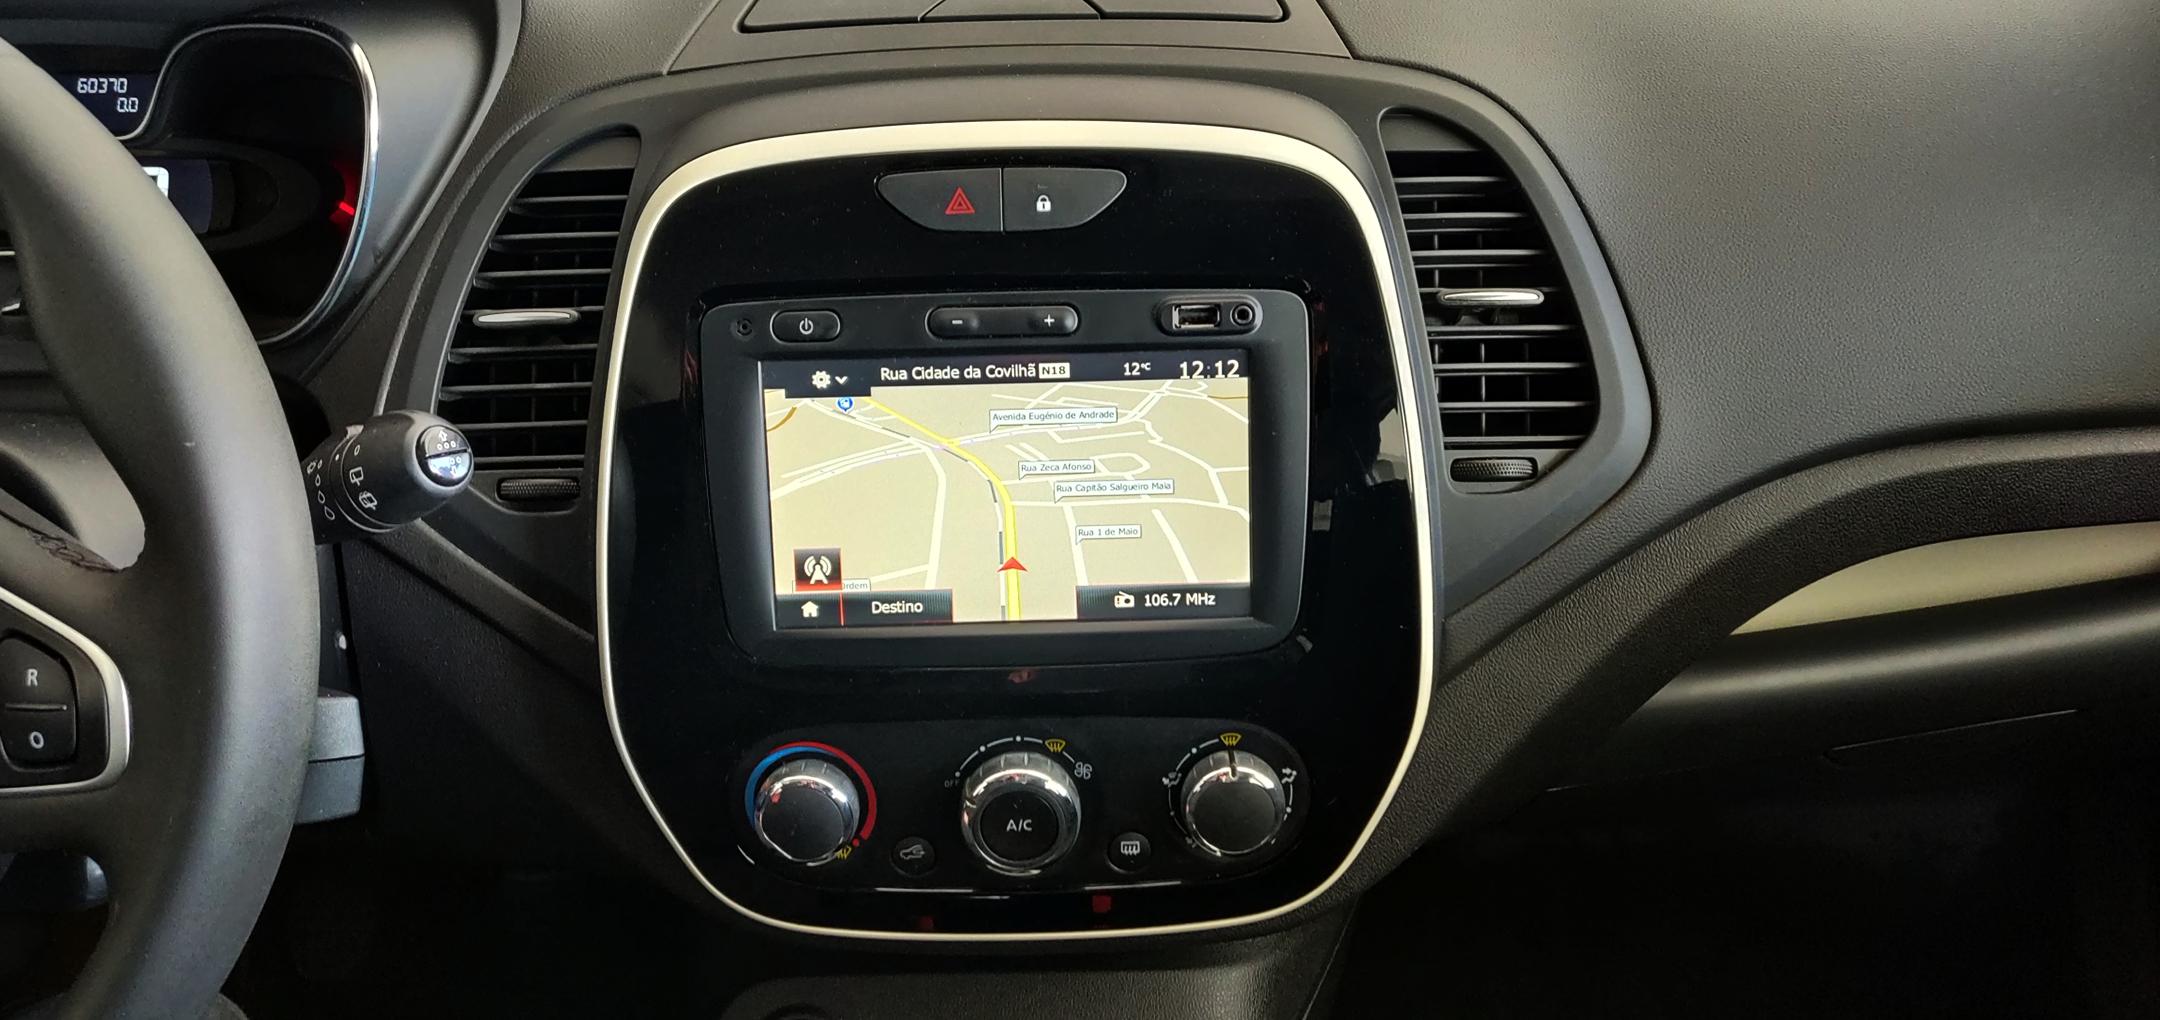 Renault Captur 1.5 Dci   Imagem 11